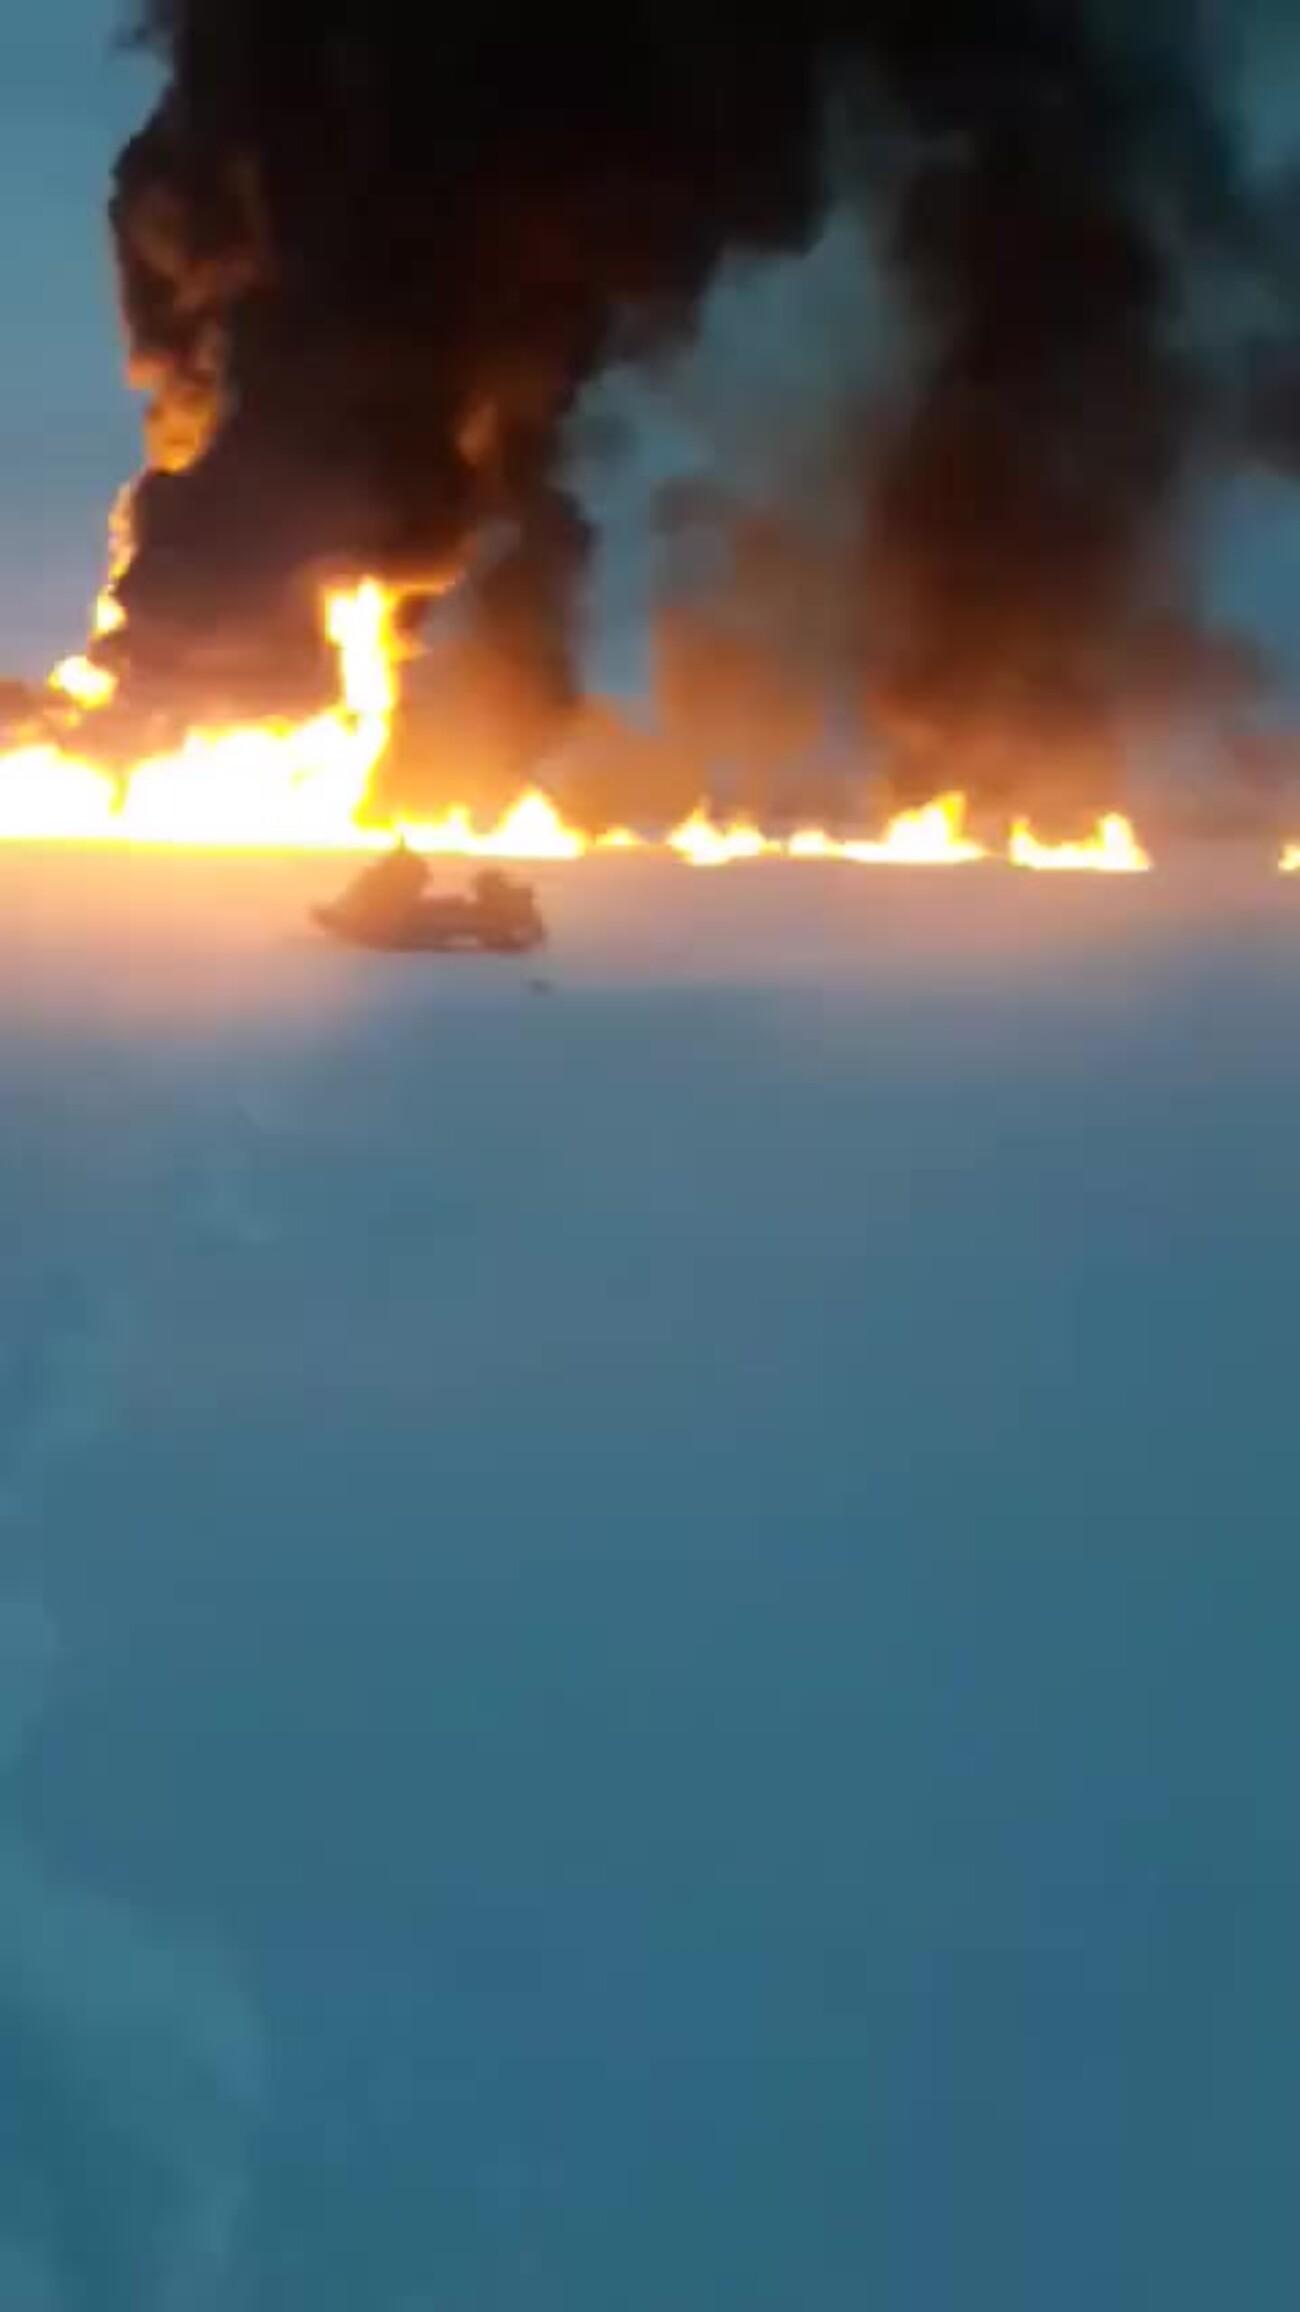 На реке Обь произошёл пожар из-за утечки газа на трубопроводе